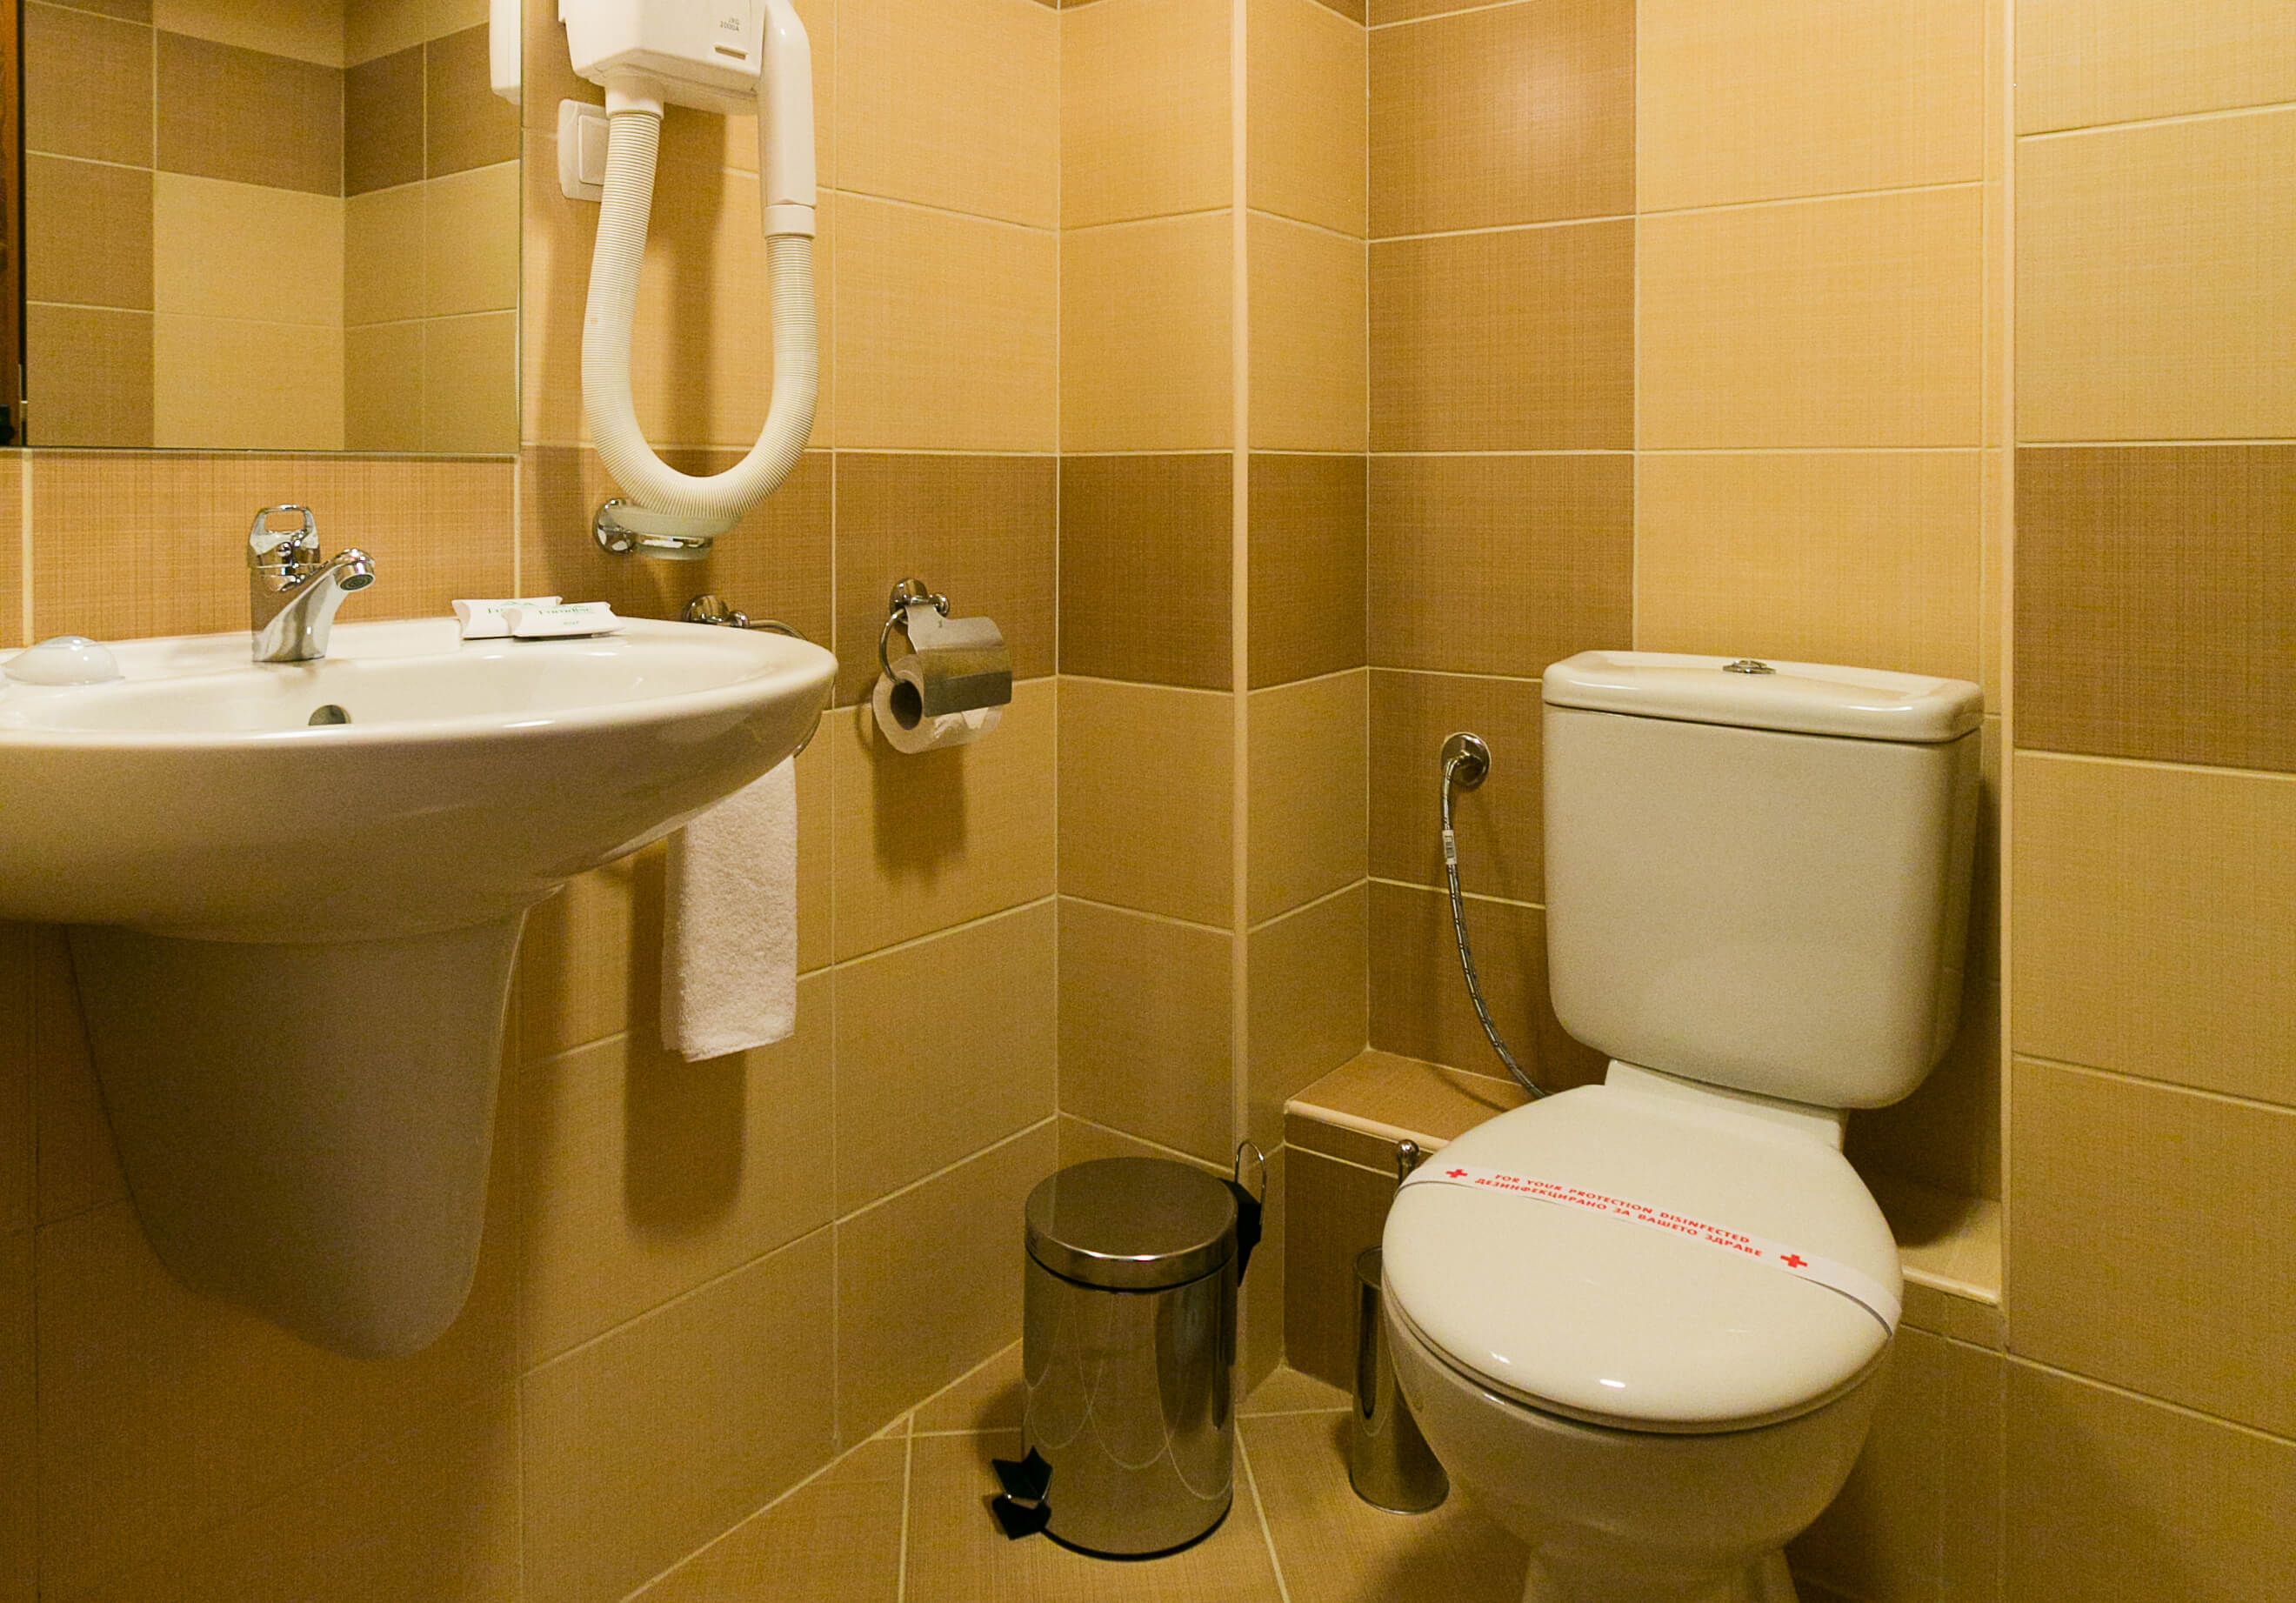 http://hotelparadise.bg/wp-content/uploads/2014/08/bathroom.jpg